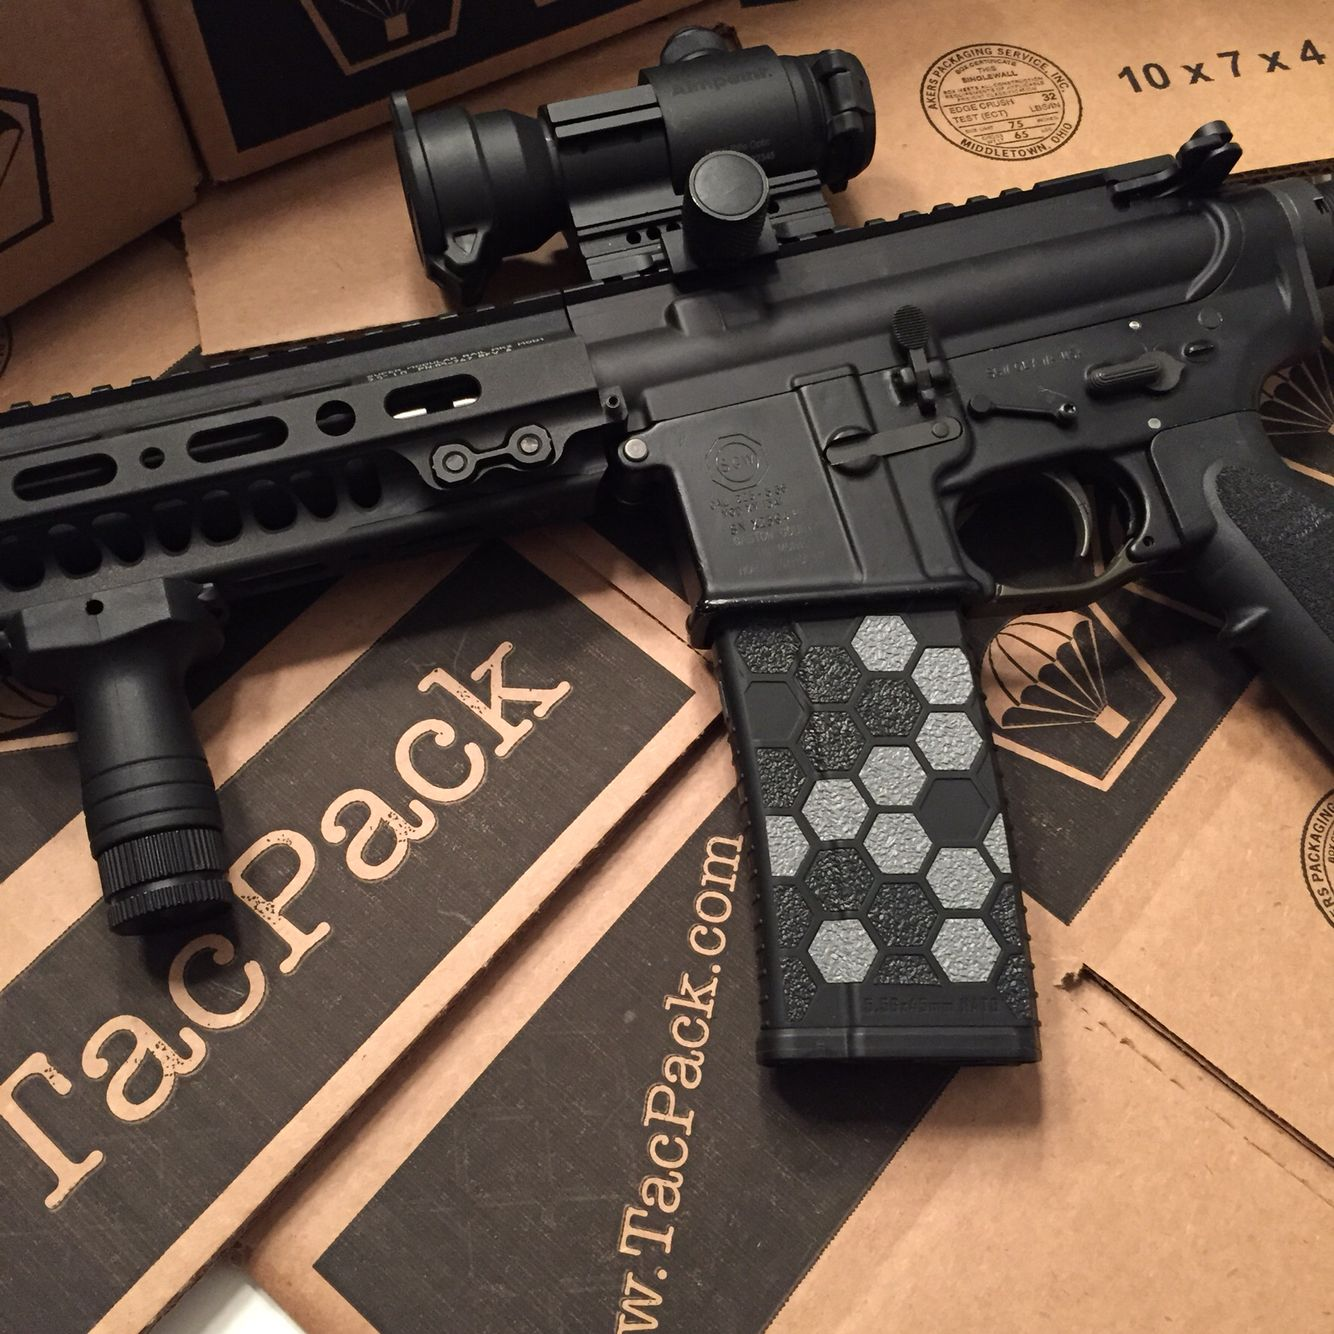 Magnificent M16 Nail Gun Embellishment - Nail Art Ideas - morihati.com